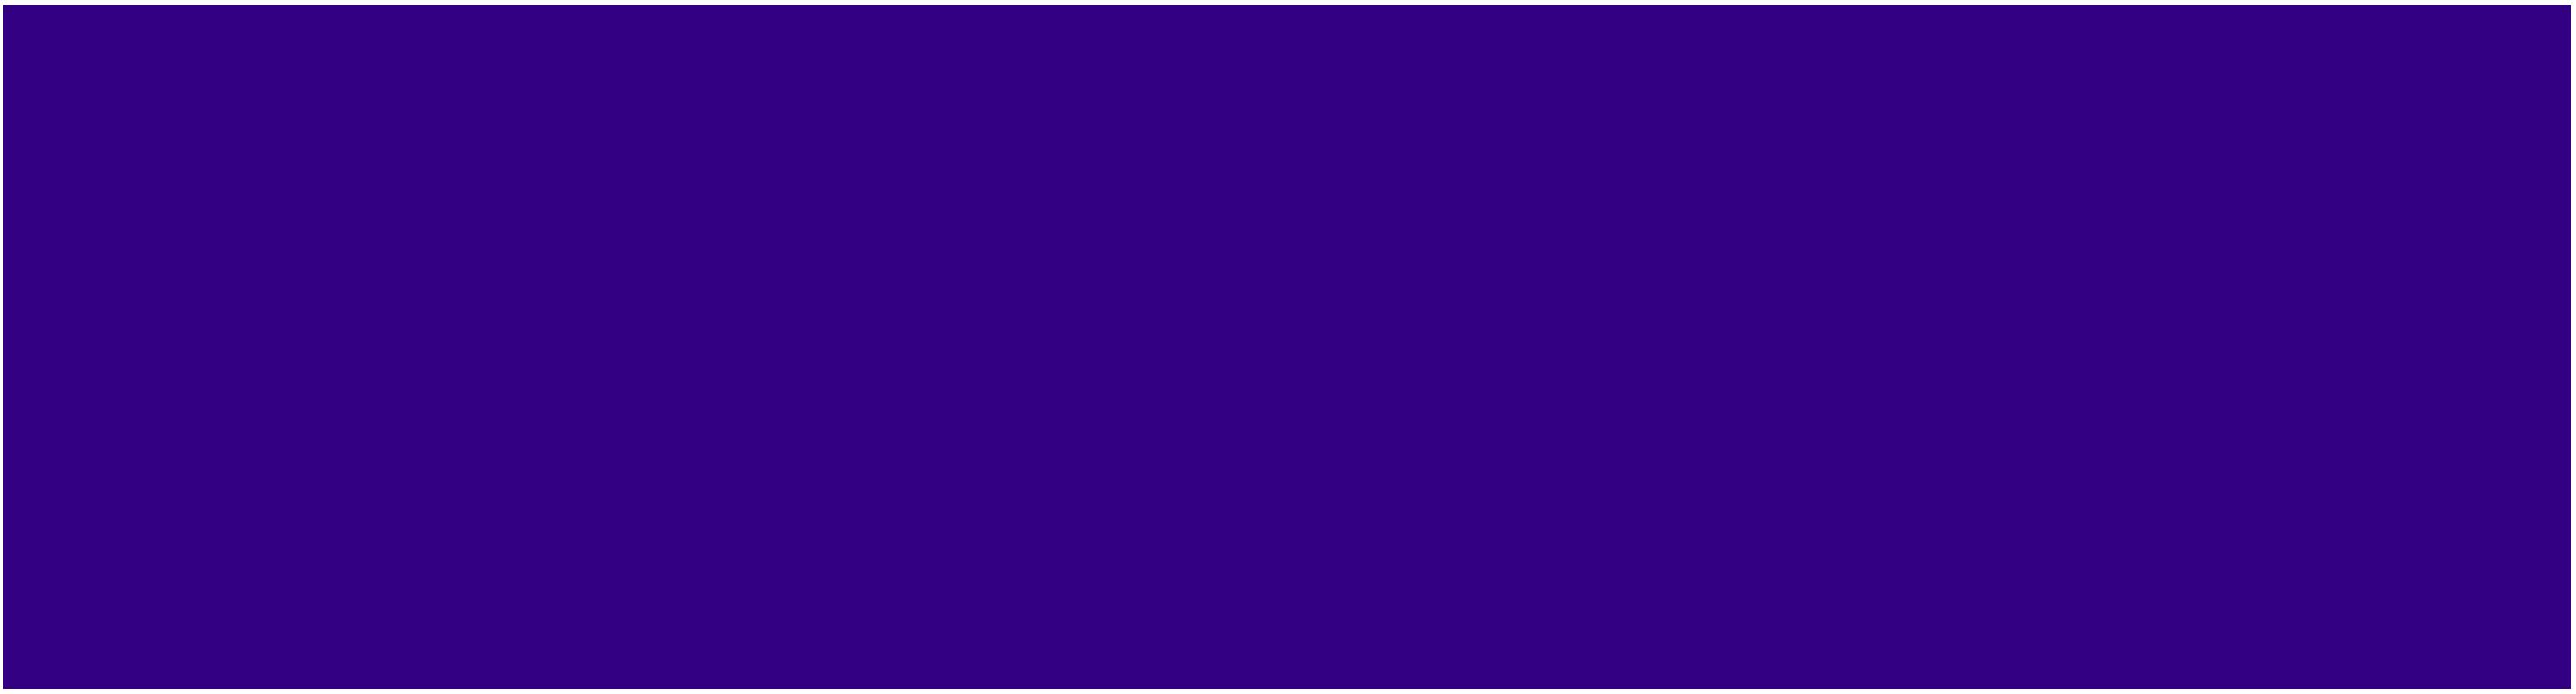 Vero Orthopaedics and Neurology